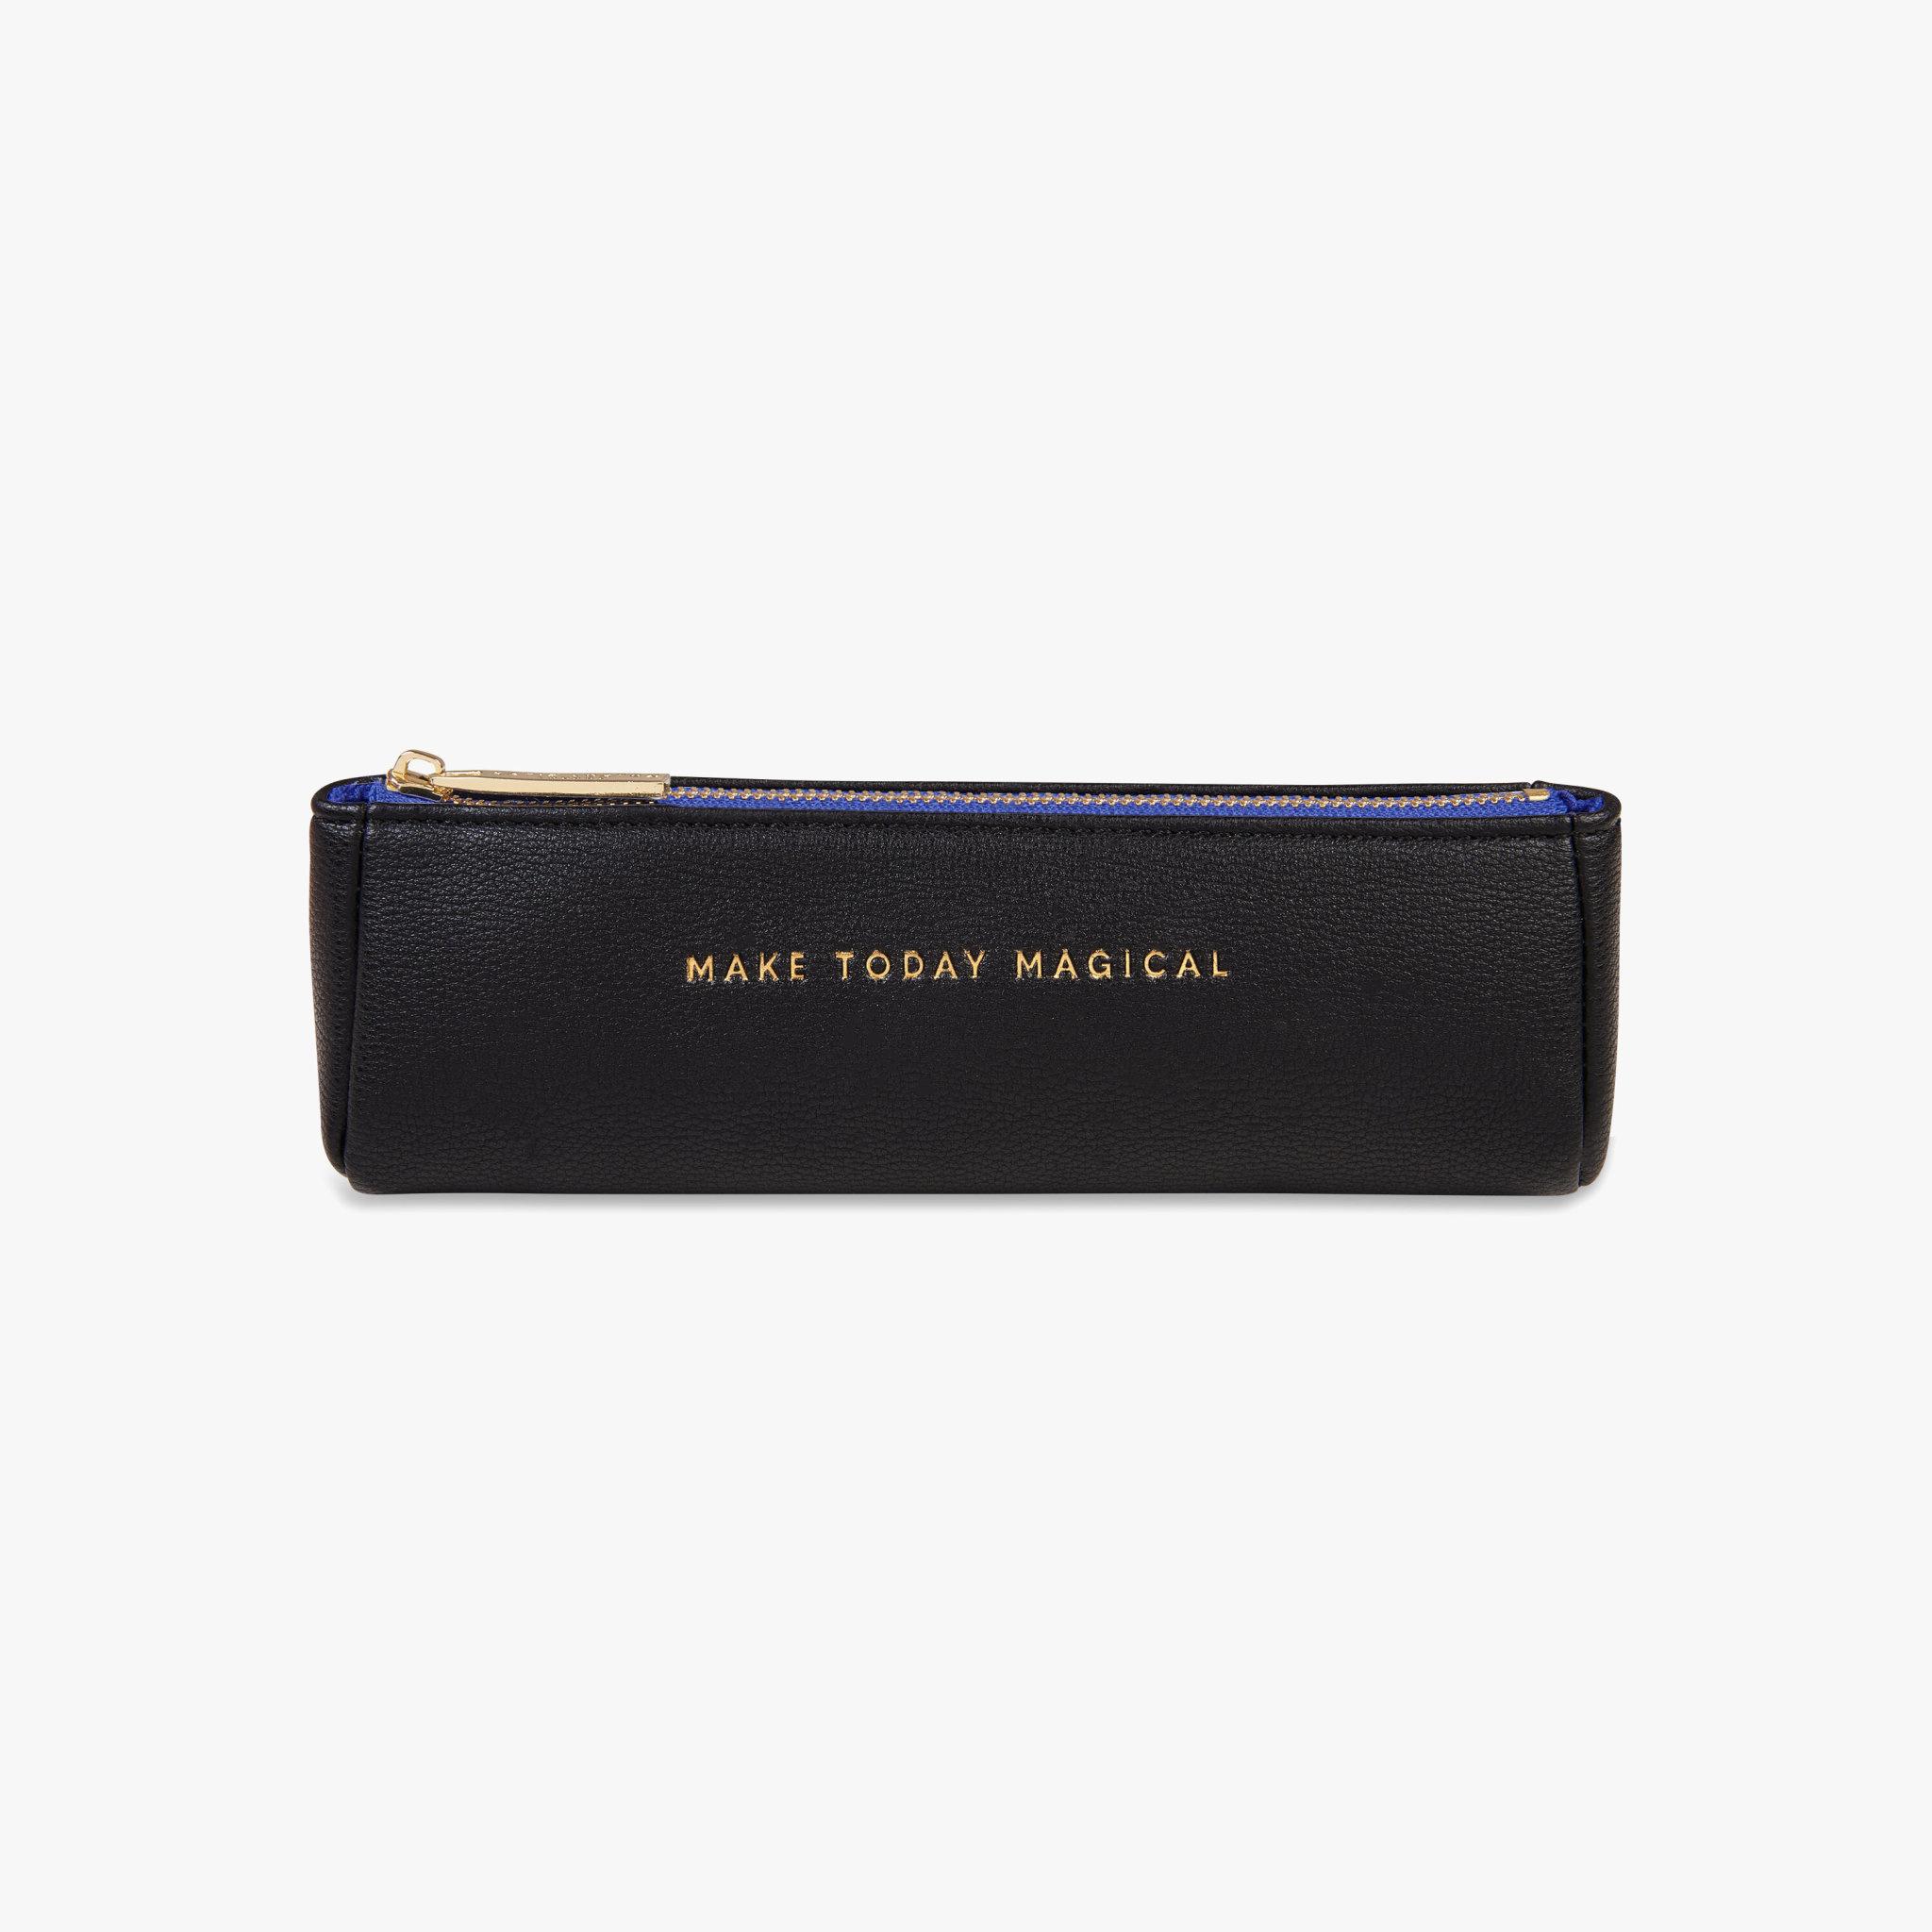 Katie Loxton Katie Loxton Pencil case - Make today magical - black 6 x 20 x 5 cm